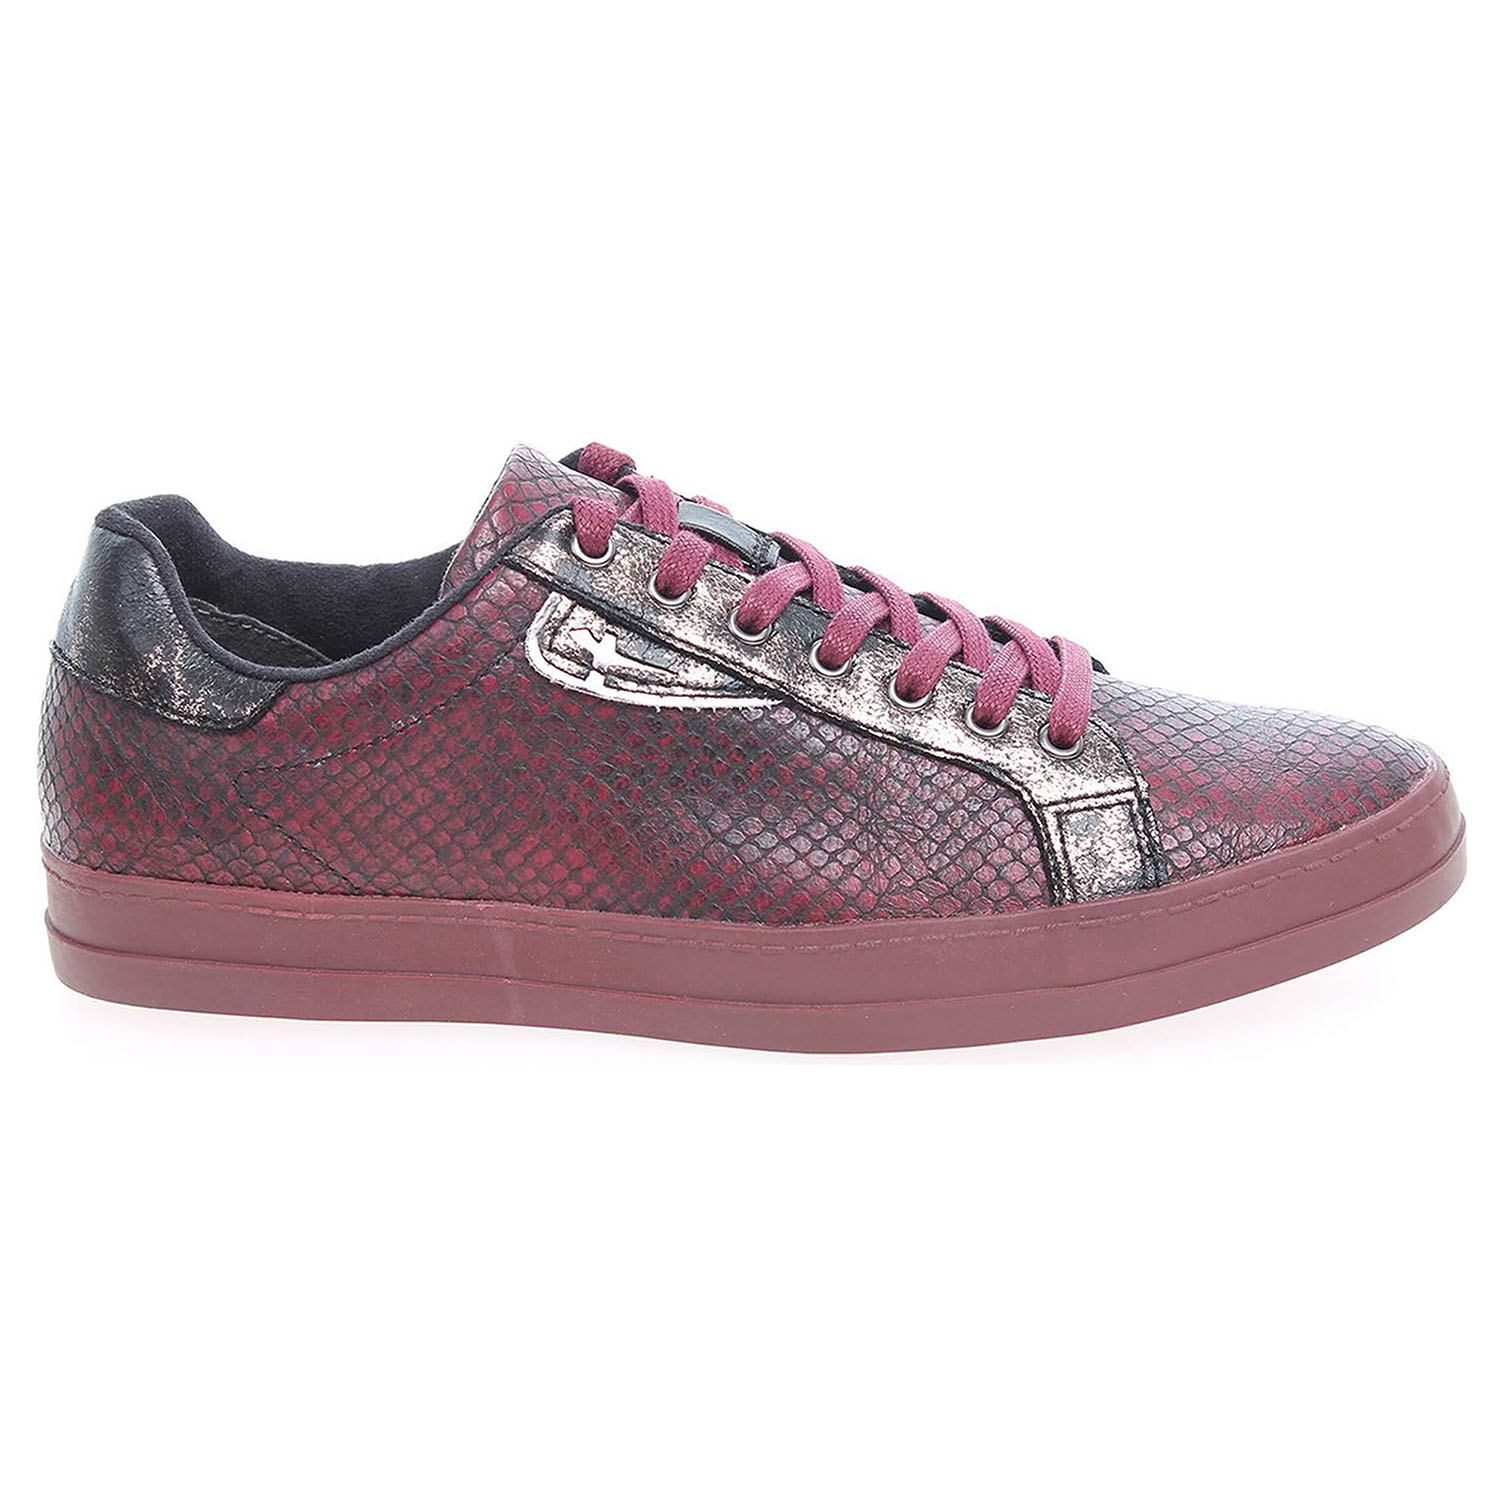 Ecco Tamaris dámská obuv 1-23606-27 vínová 23200576 6be1458a84c